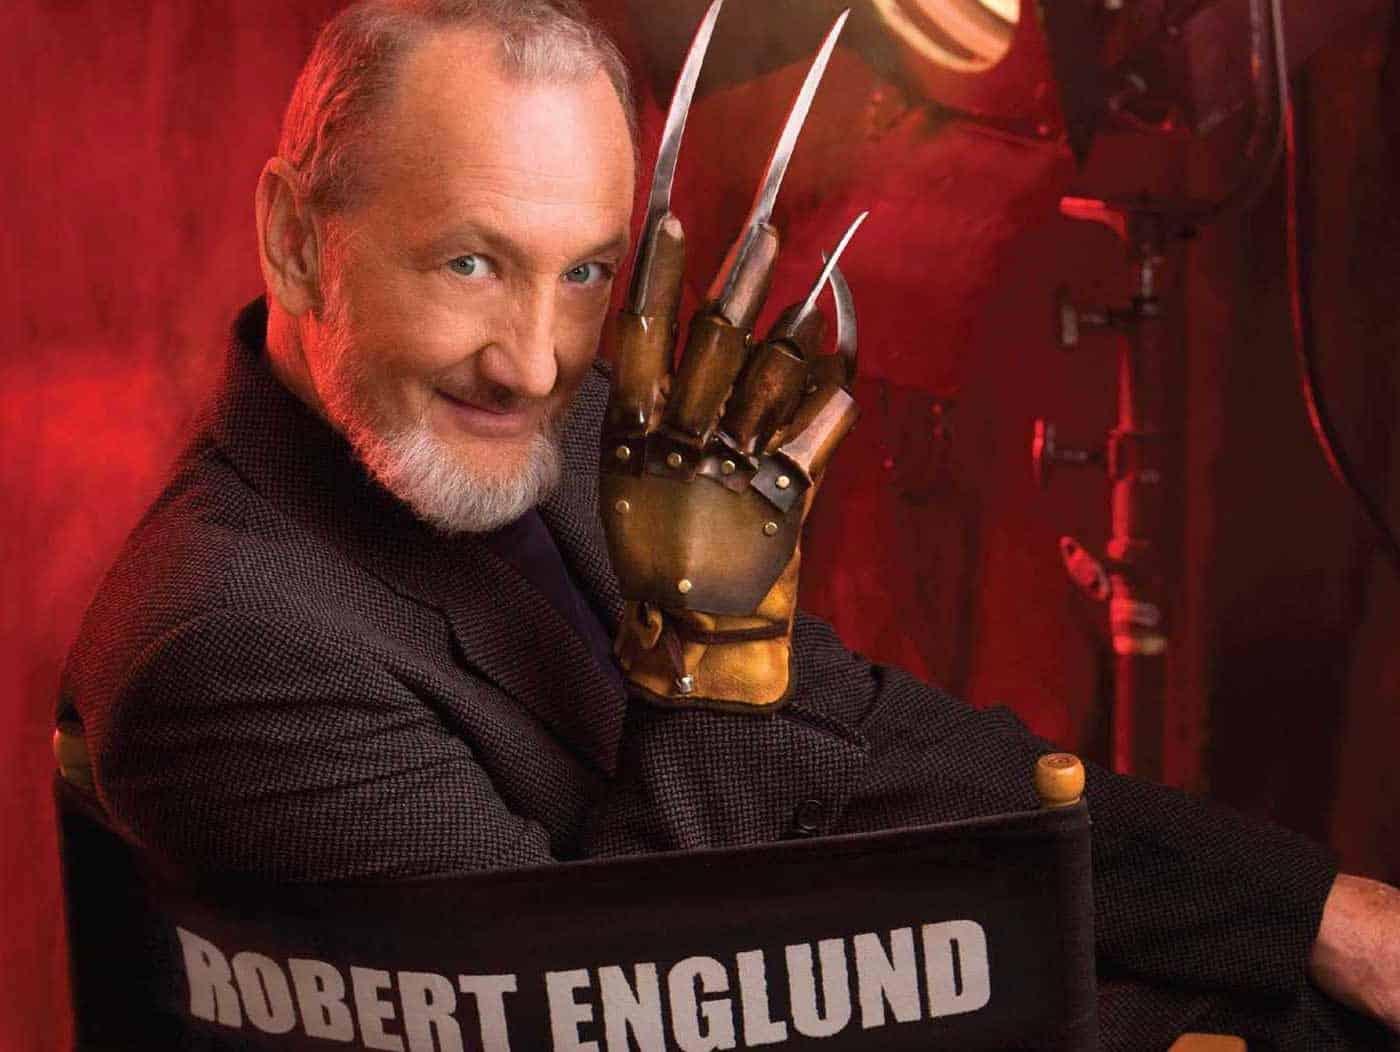 Robert Englund revivirá a Freddy Krueger en pantalla chica en la serie The Goldbergs de ABC